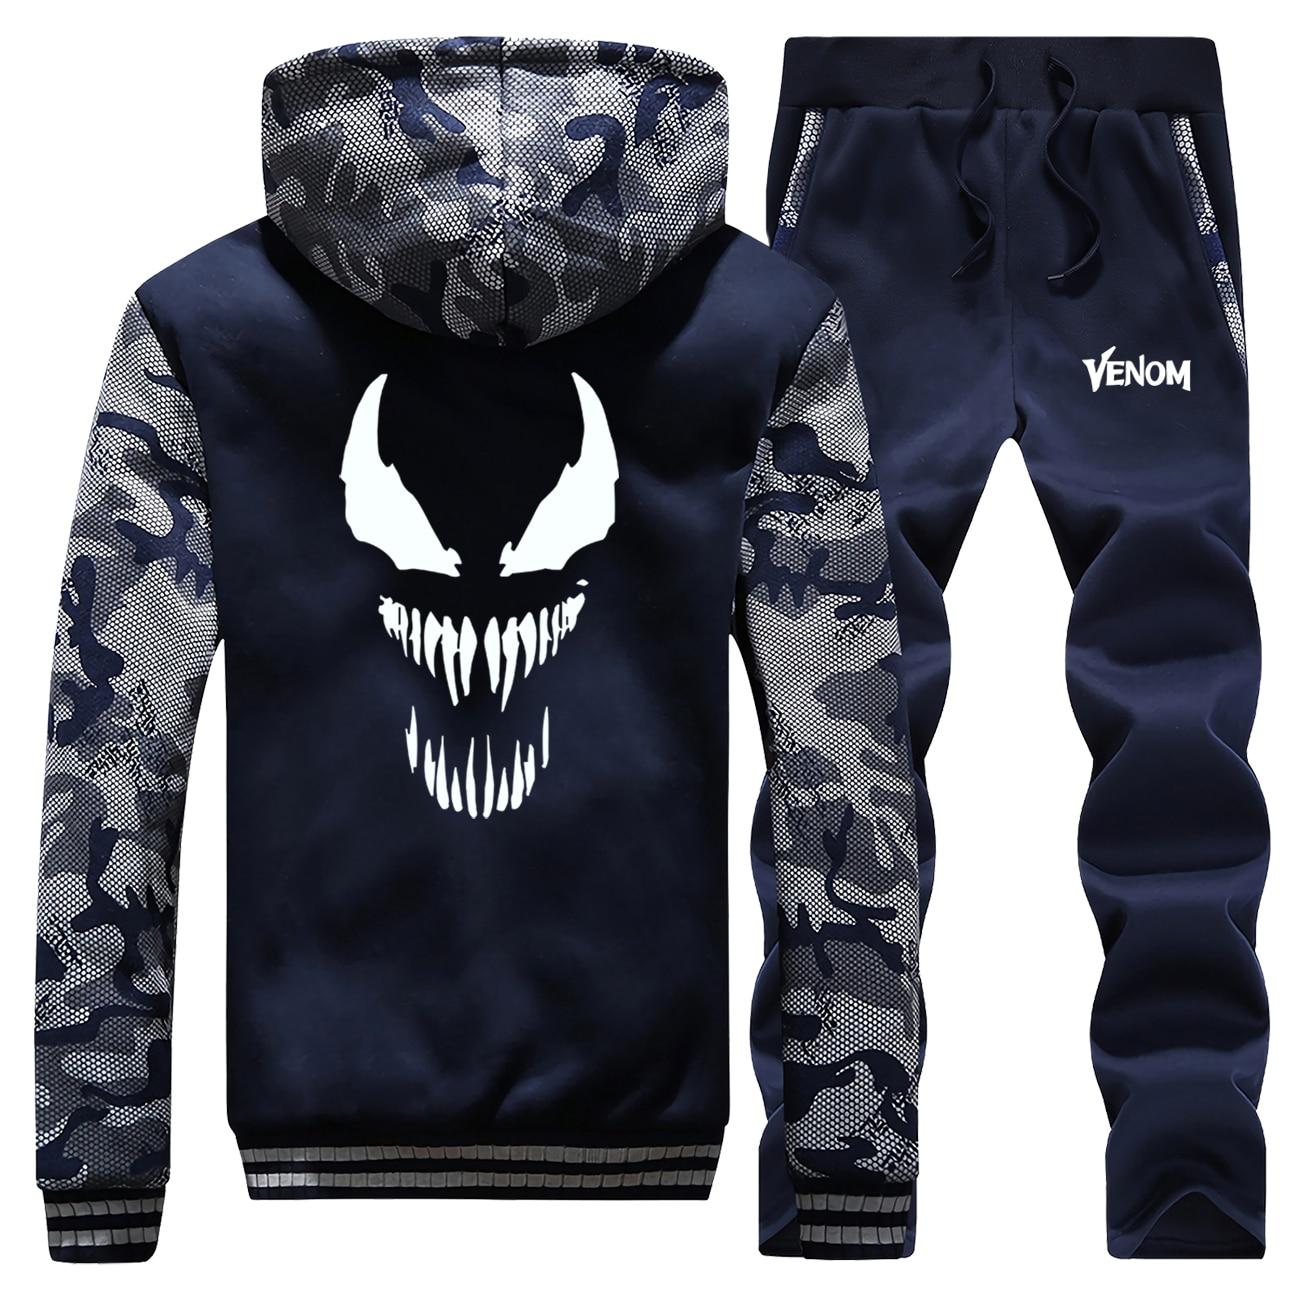 Venom Marvel Hot Sale 2019 Winter Mens Hoodies Camouflage Coat Thick Suit Long Sleeve Warm Jackets Sportswear+Pants 2 Piece Set